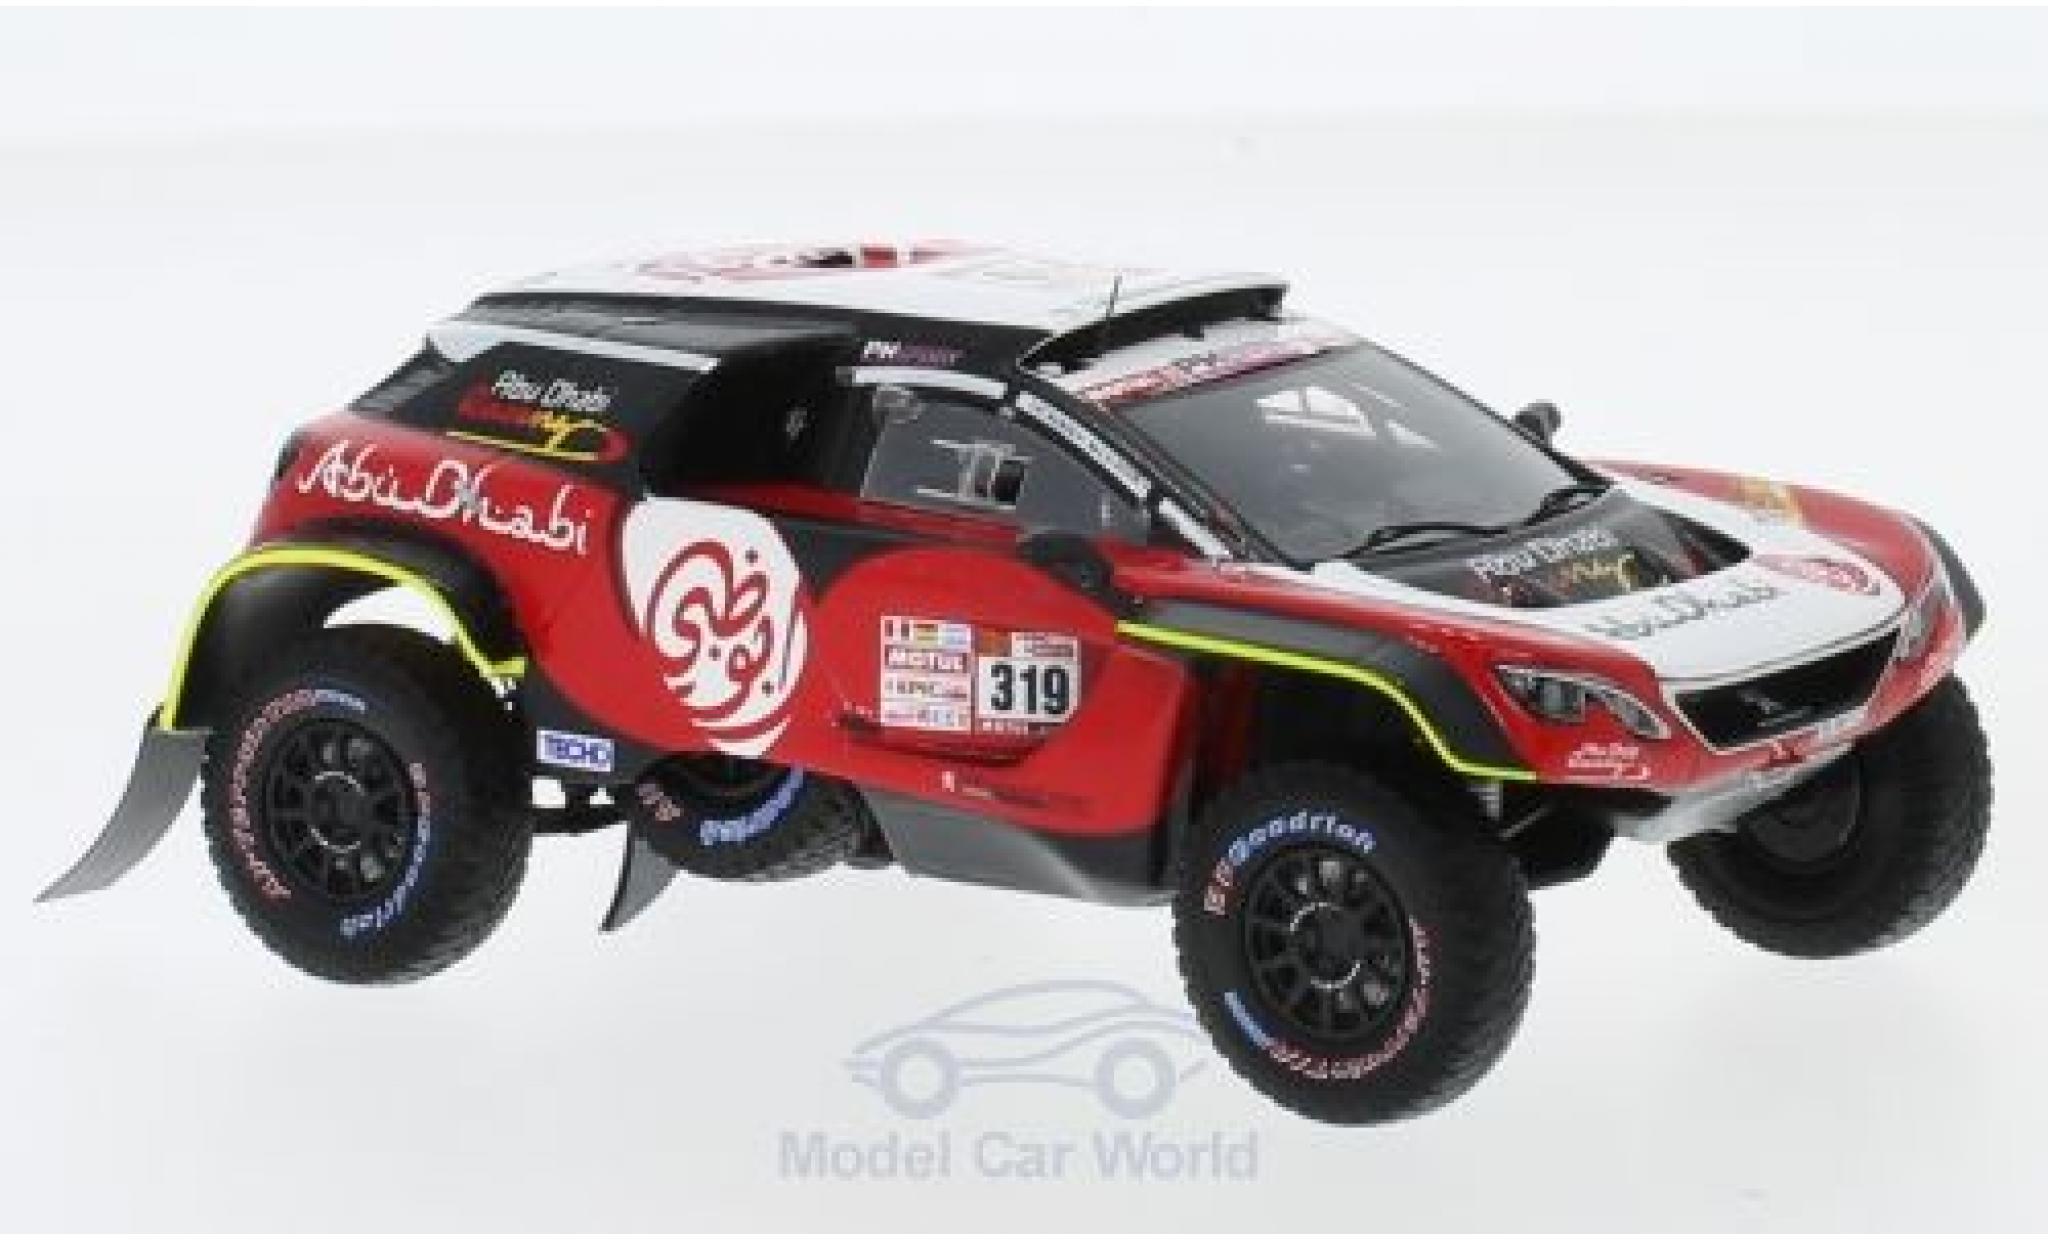 Peugeot 3008 1/43 Spark DKR Maxi No.319 PH-Sport Abu Dhabi Rallye Dakar 2018 K.AI Qassimi/P.Maimom